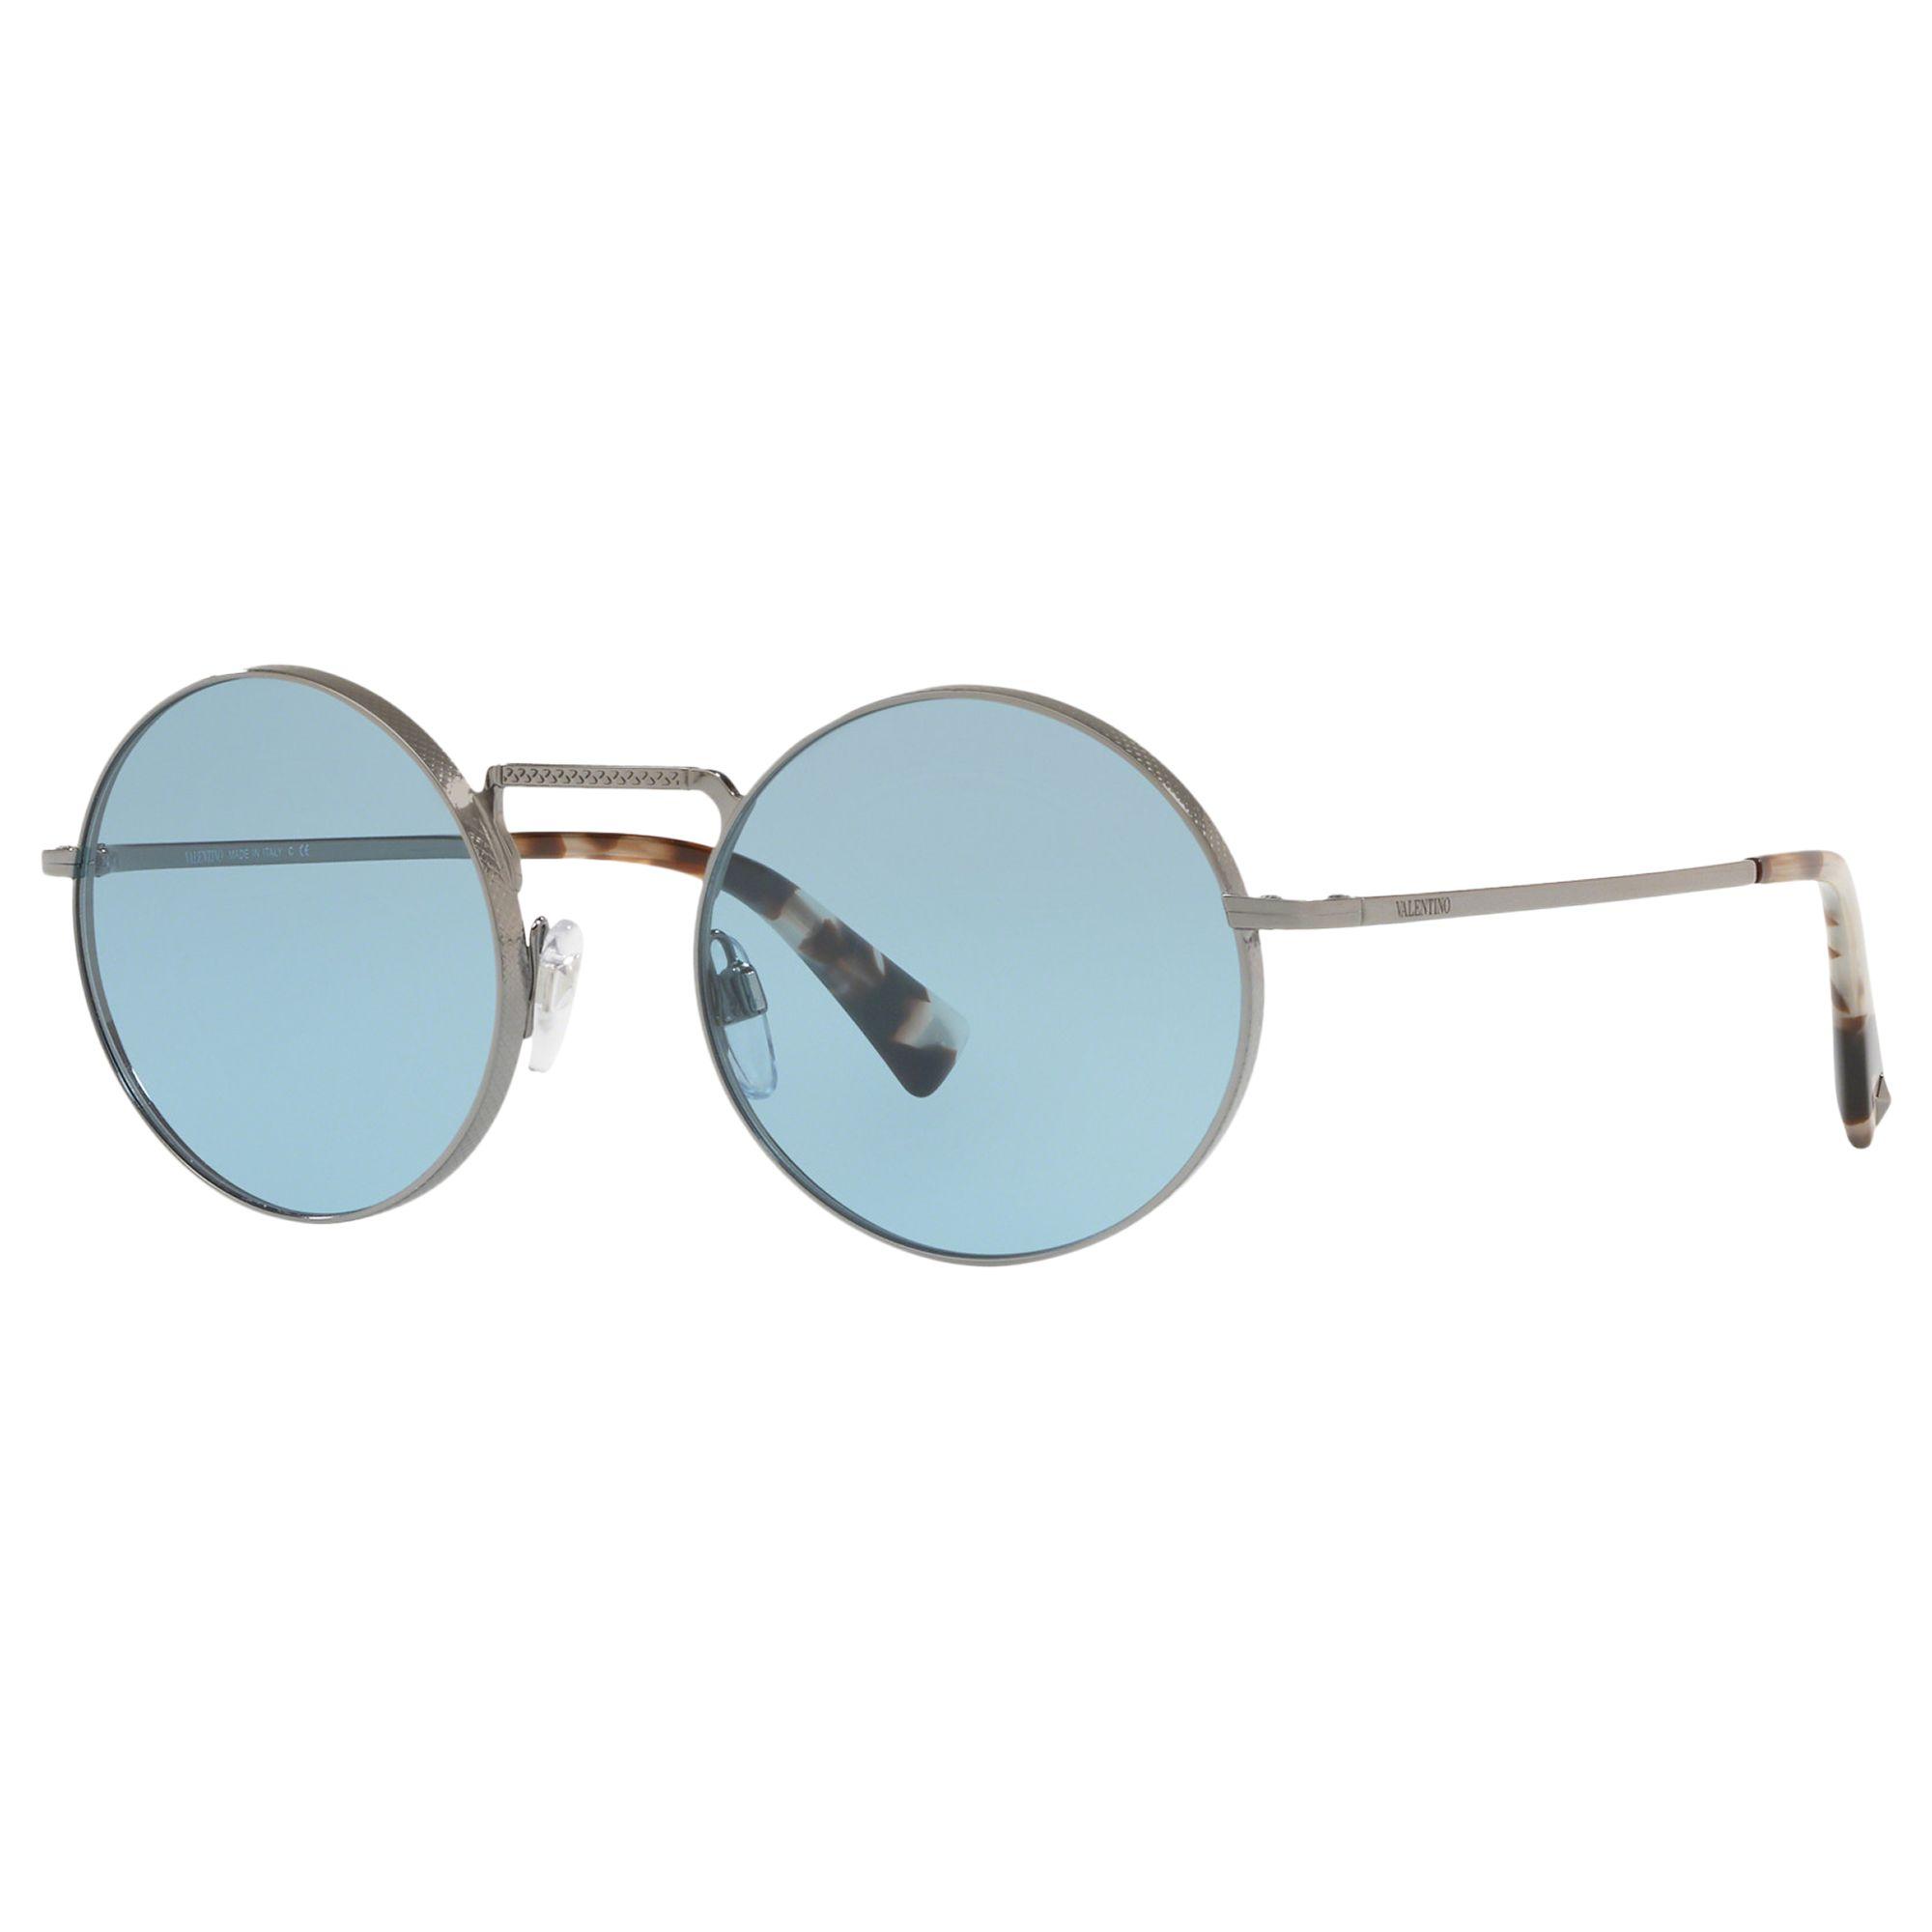 Valentino Valentino VA2024 Women's Round Sunglasses, Silver/Blue